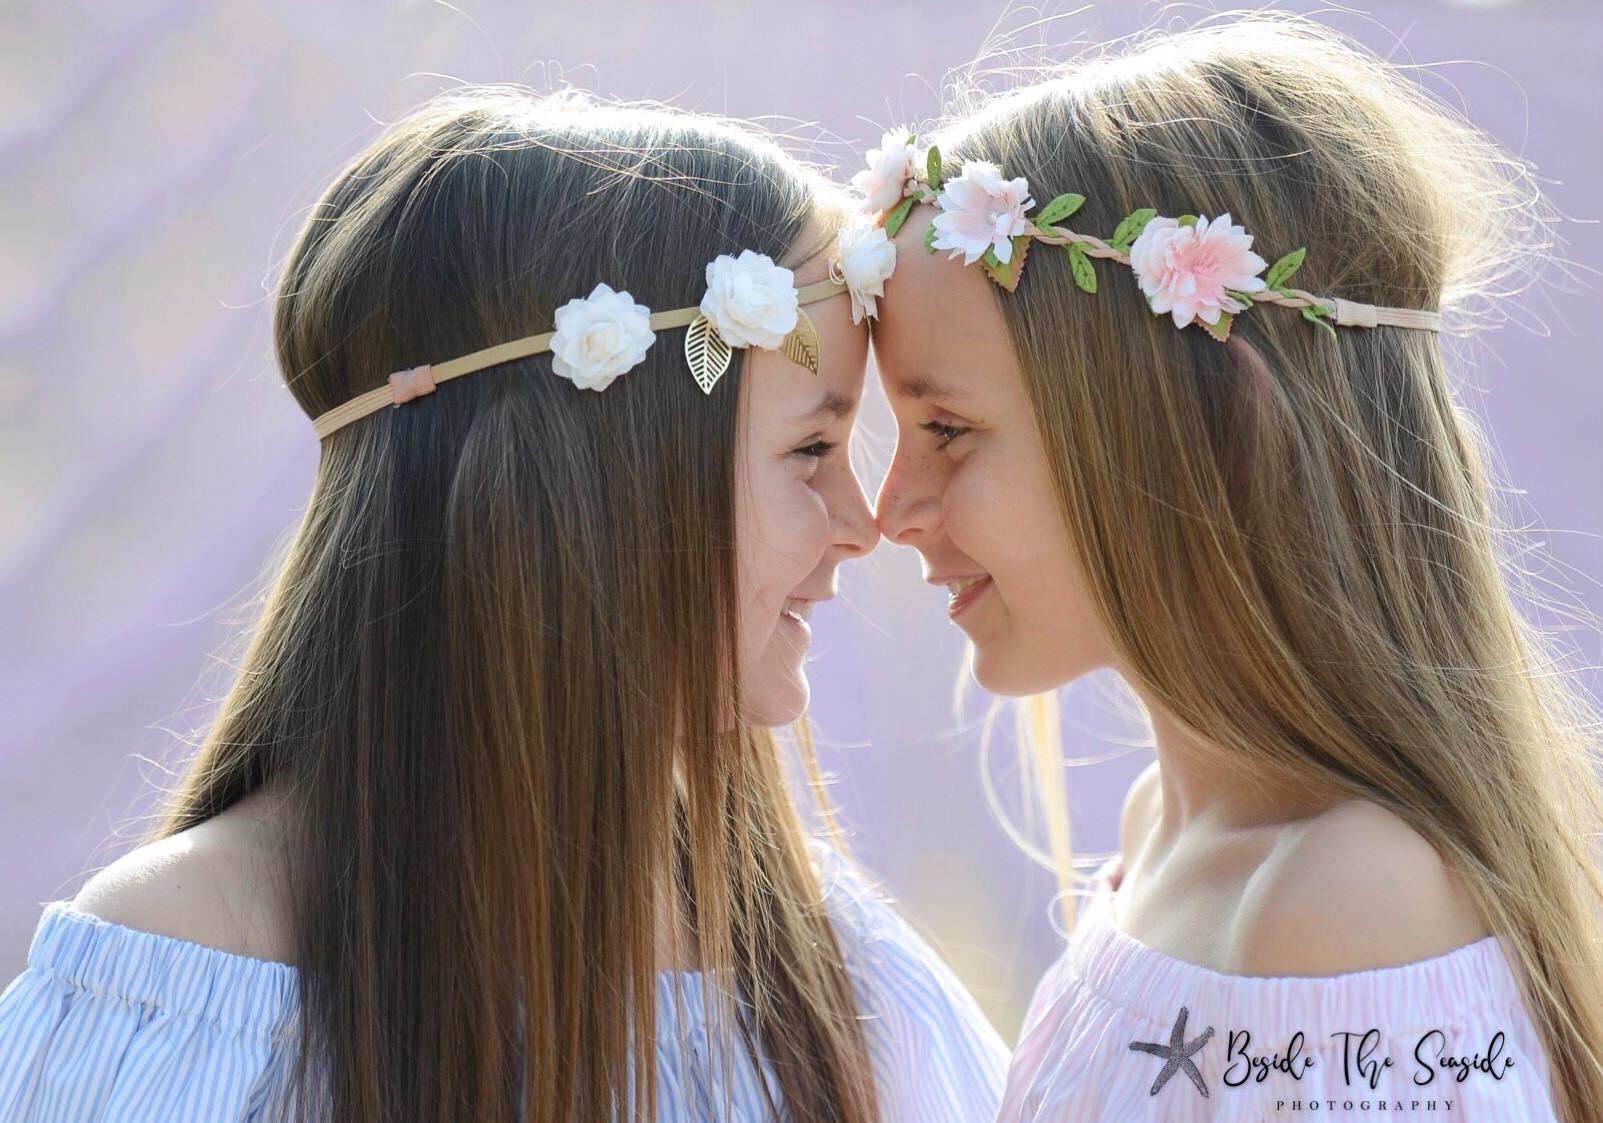 Sisters Bella & Grace in the lavender -  Lordington